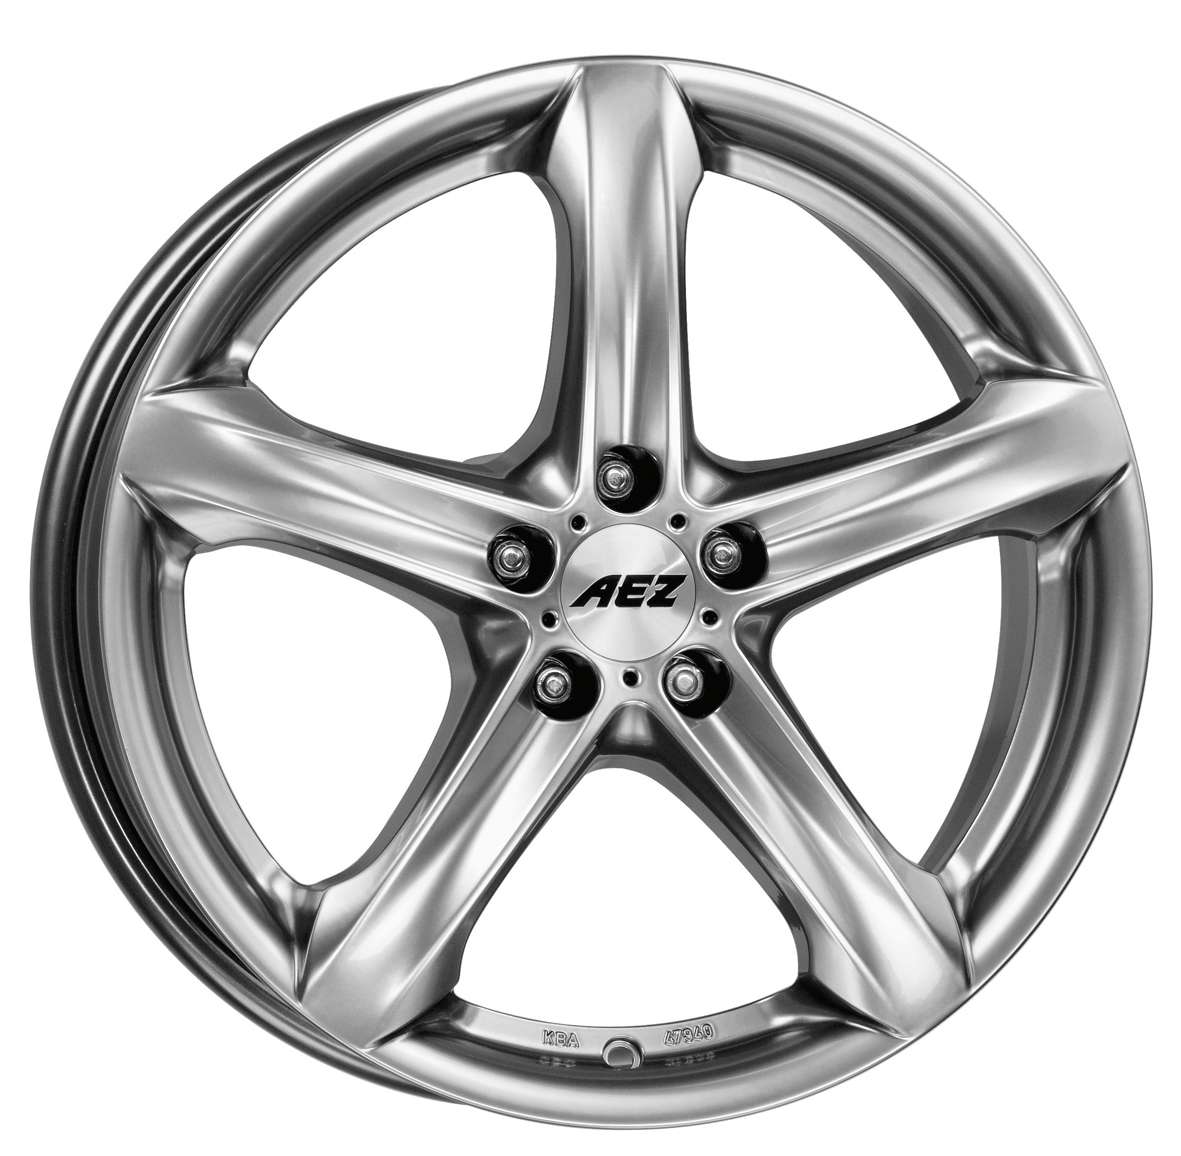 AEZ / Yacht SUV